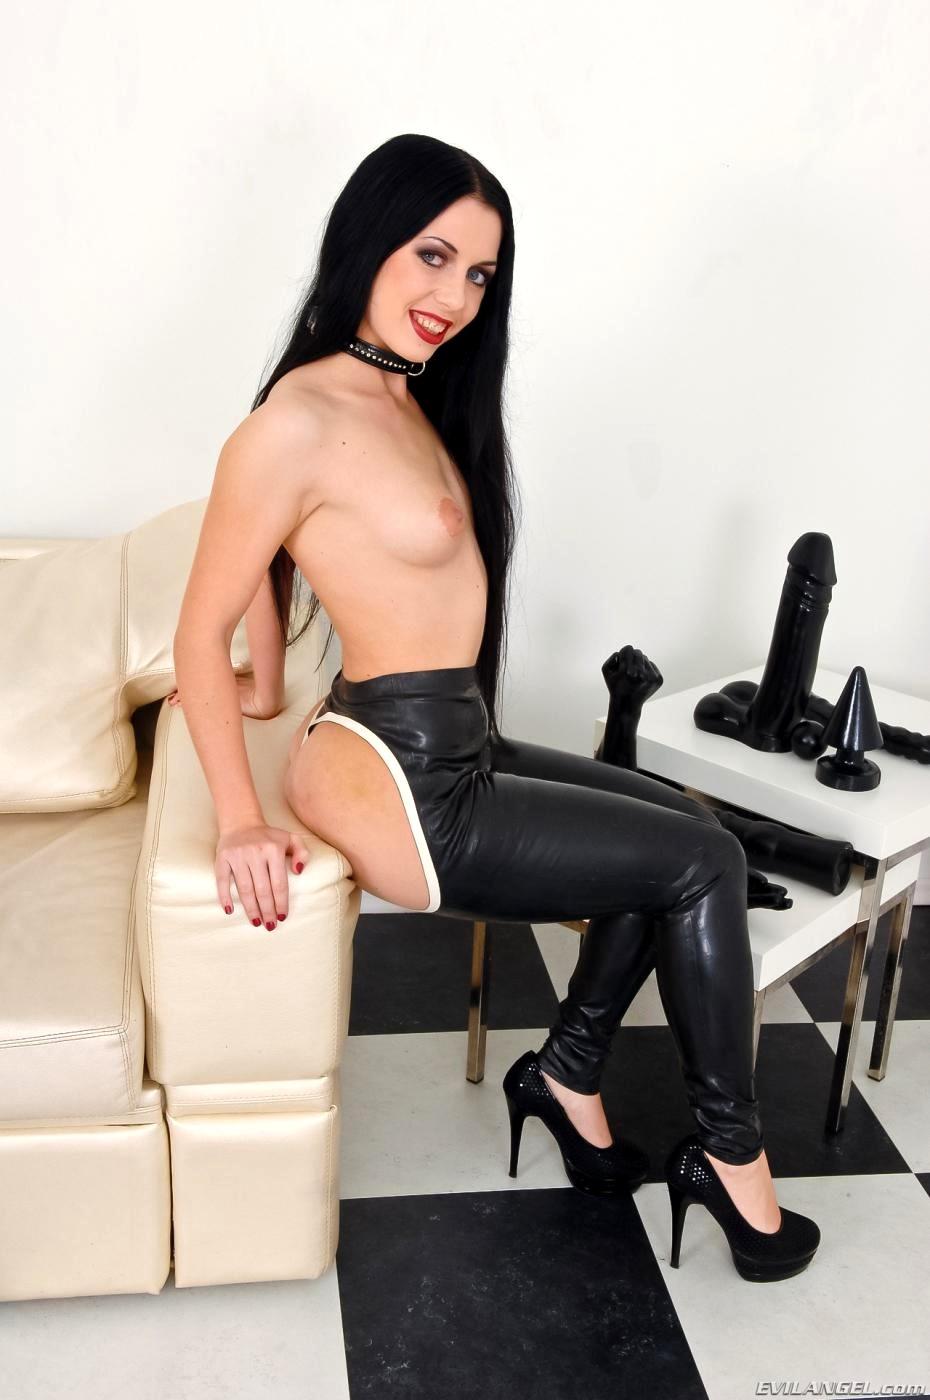 isabella clark porn